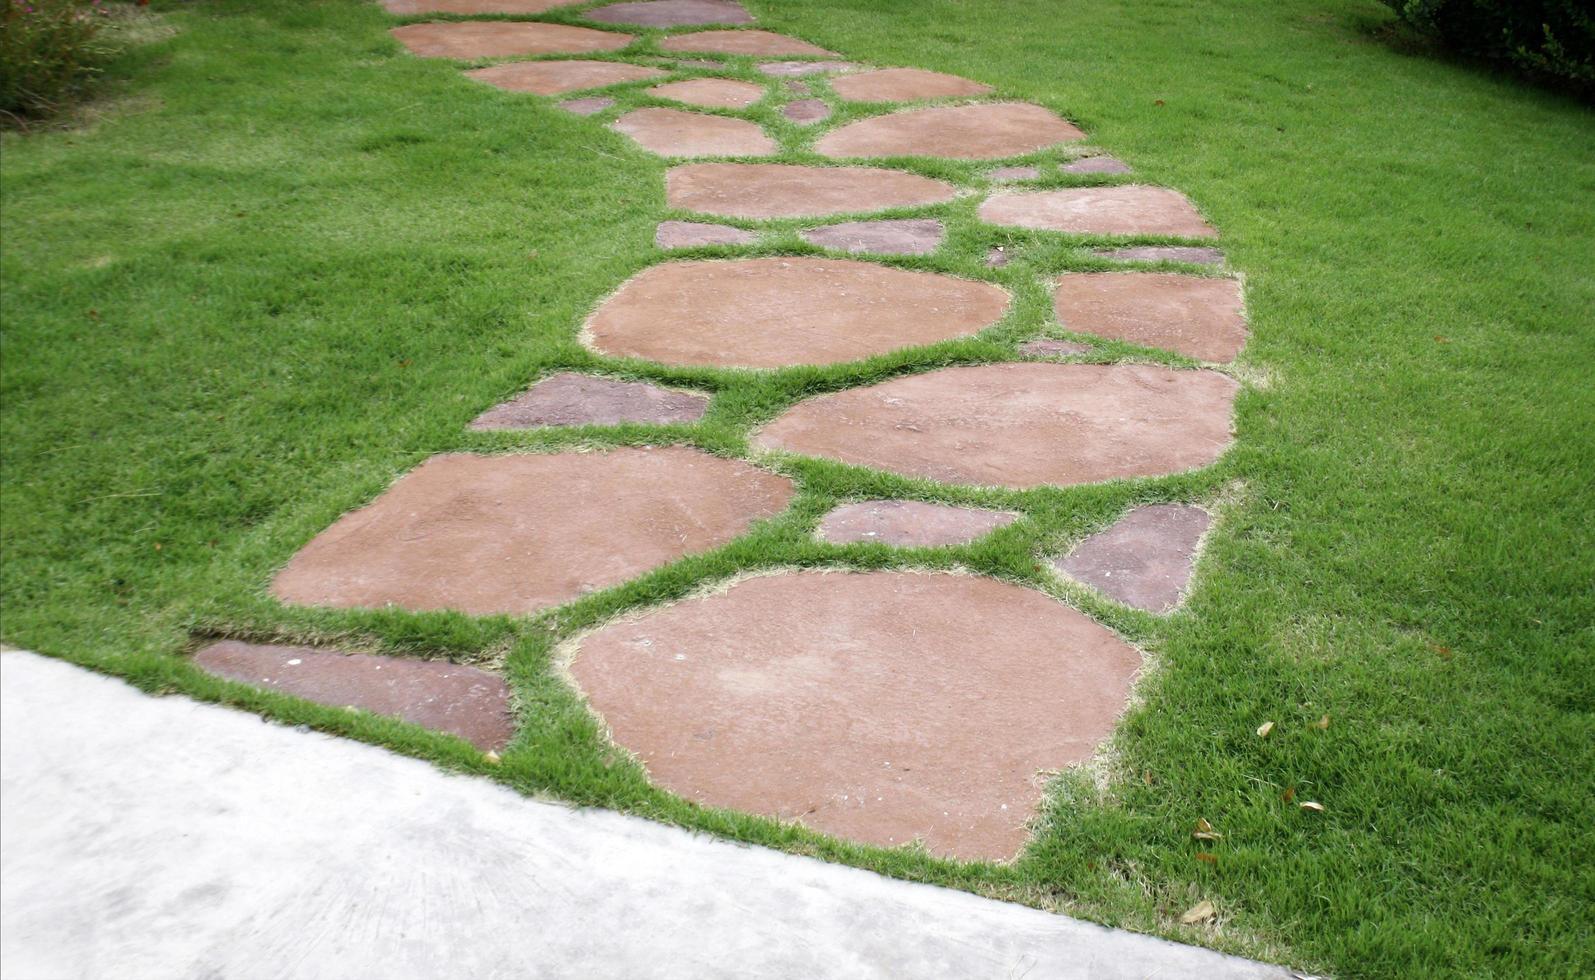 Walking path in grass photo